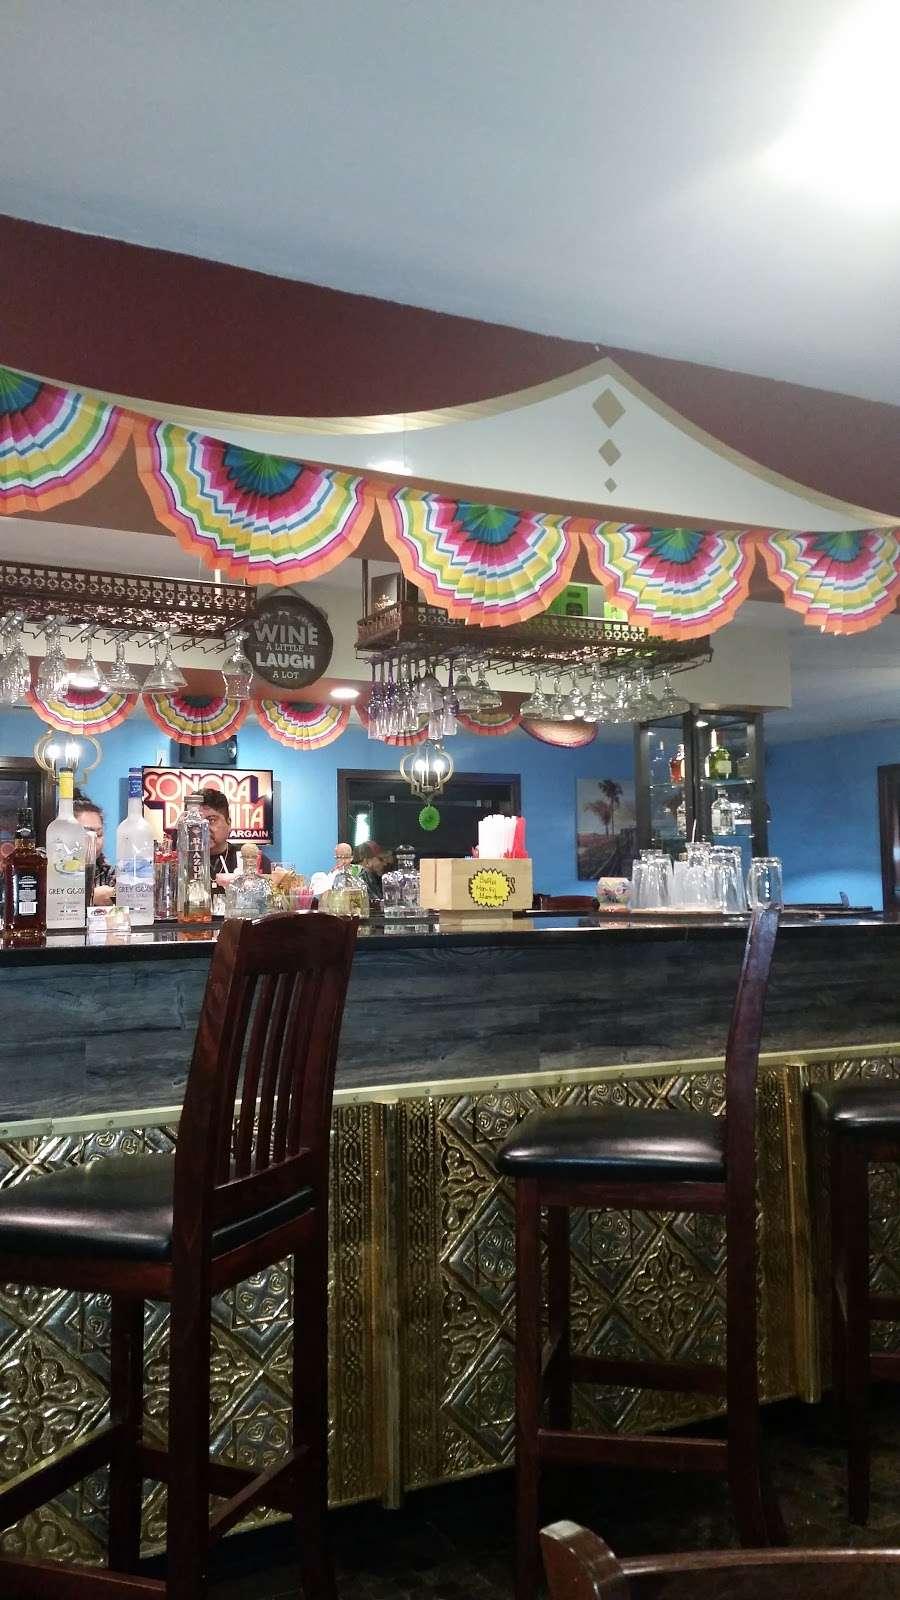 El Chivolin Restaurant - restaurant  | Photo 3 of 10 | Address: 4171 S 76th St, Greenfield, WI 53220, USA | Phone: (414) 810-0482